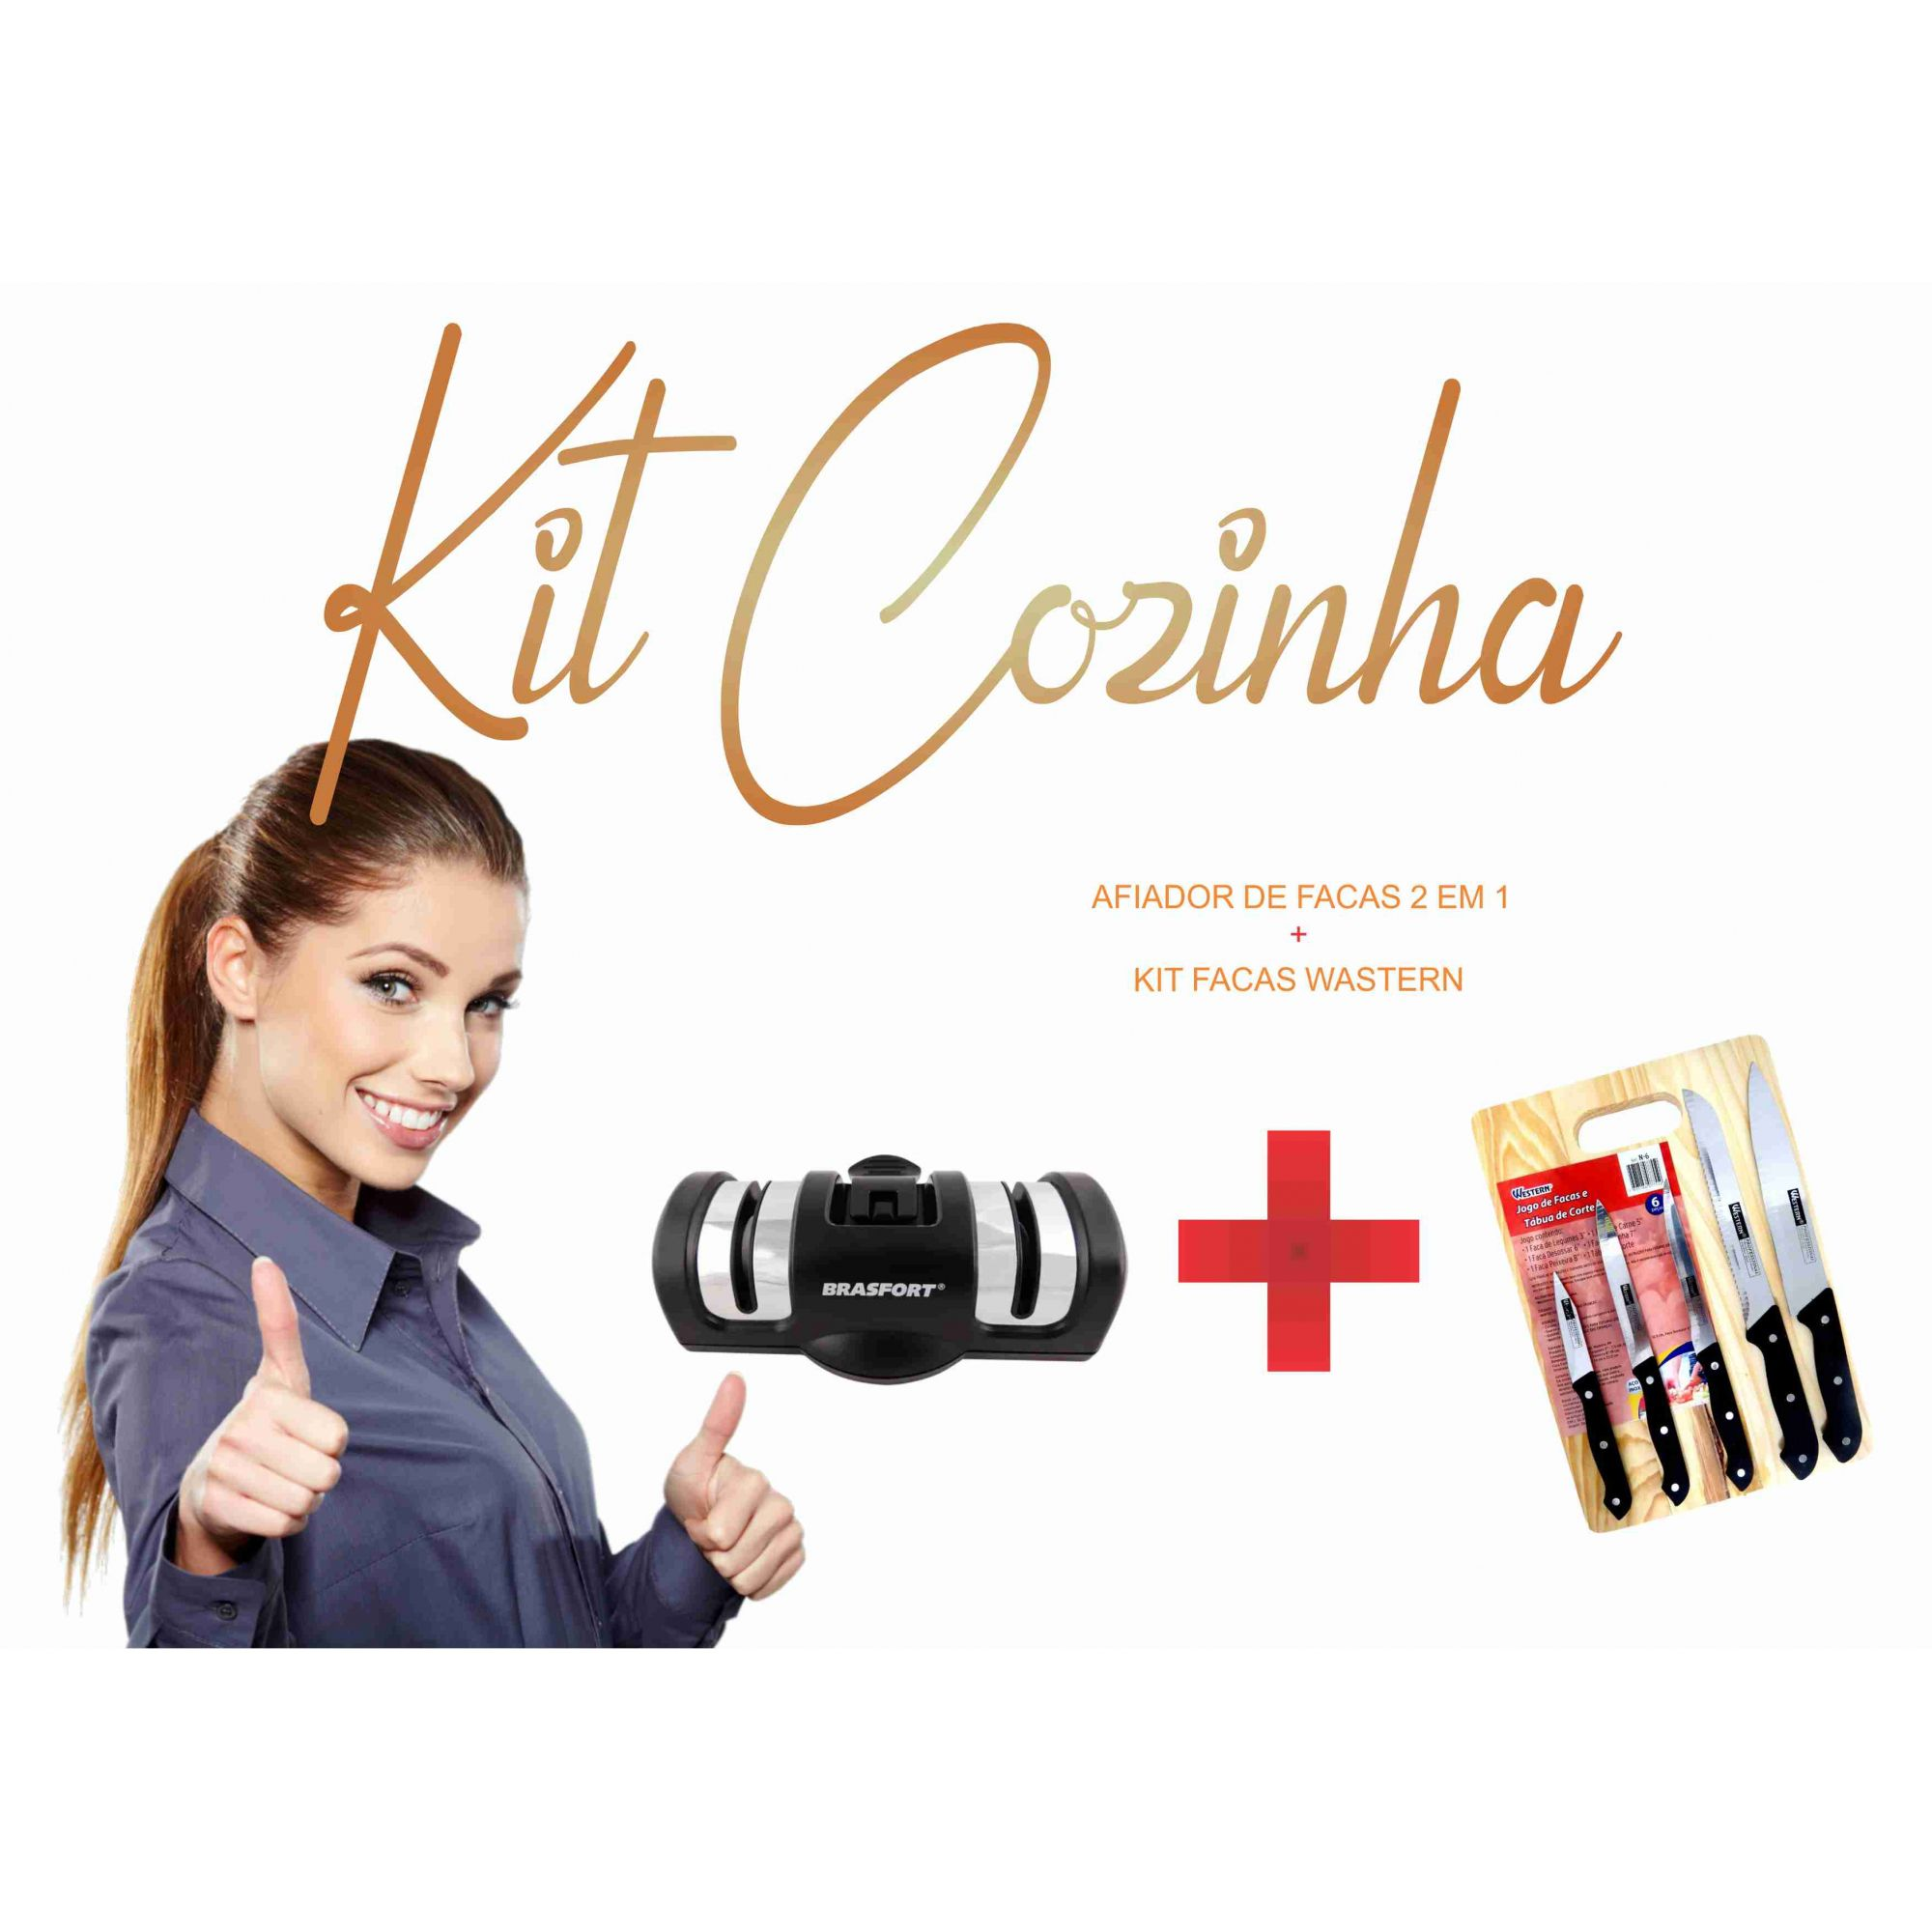 Kit Facas Wastern c/ Tabua de Cortes + Afiador de Facas 2 em 1 Brasfort